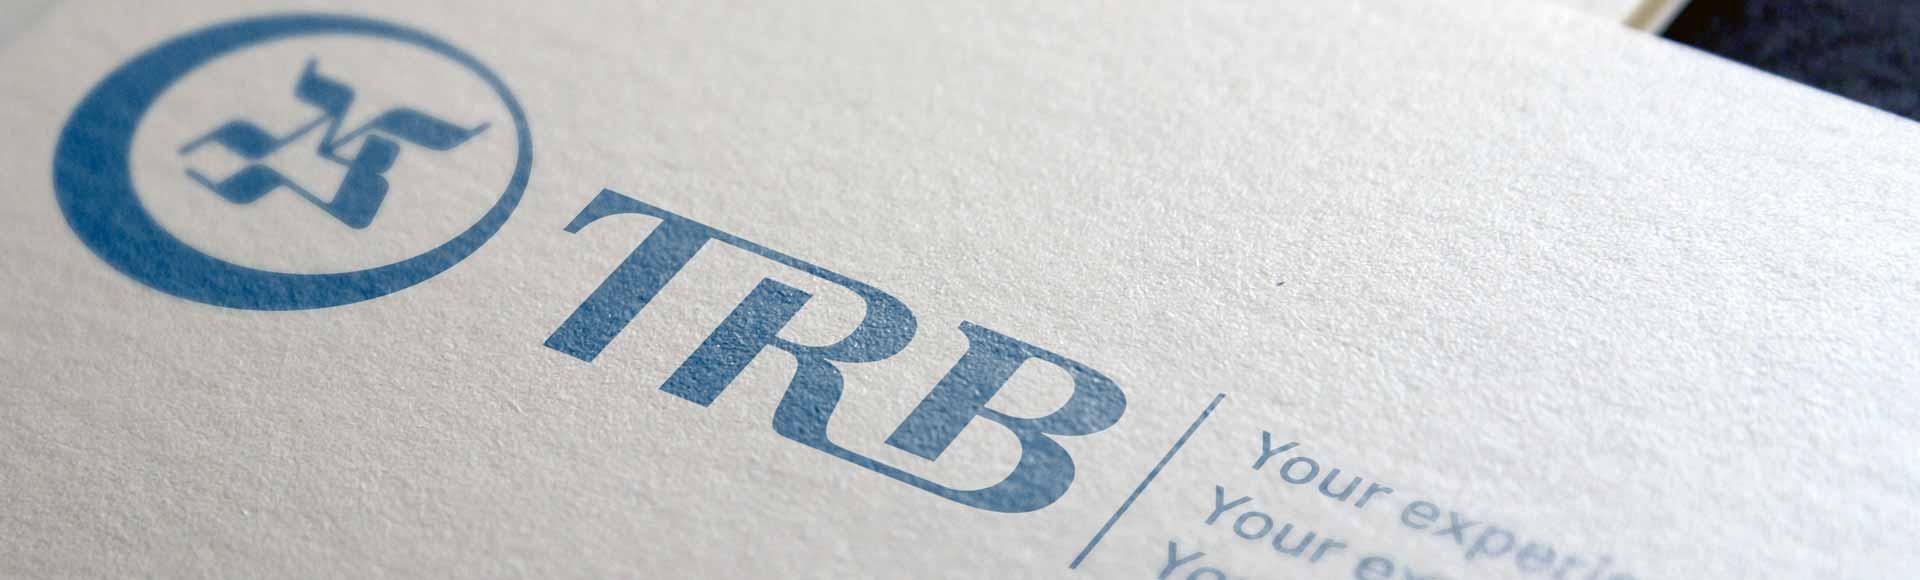 TRB-Chemedica-nuovo-logo-header-banner-1920x580